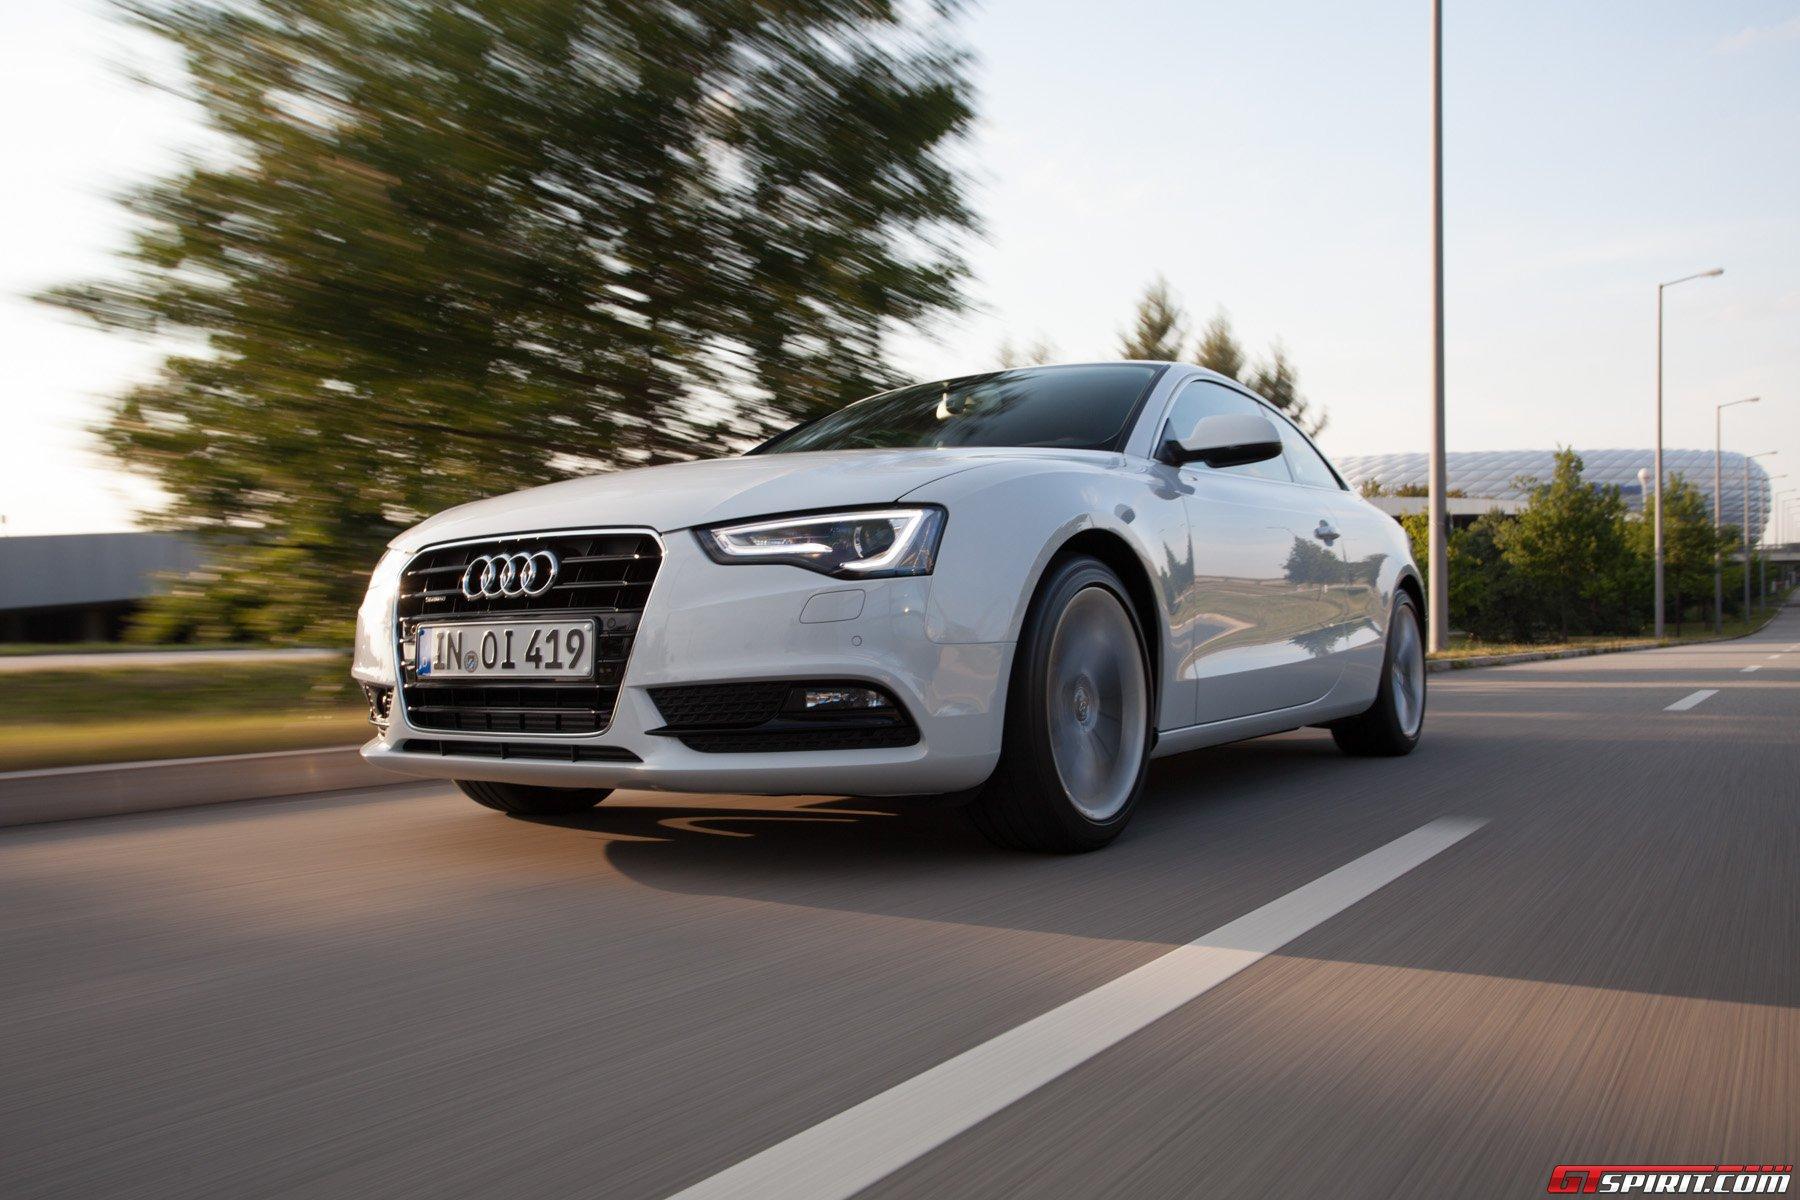 Kelebihan Audi A5 3.0 Review